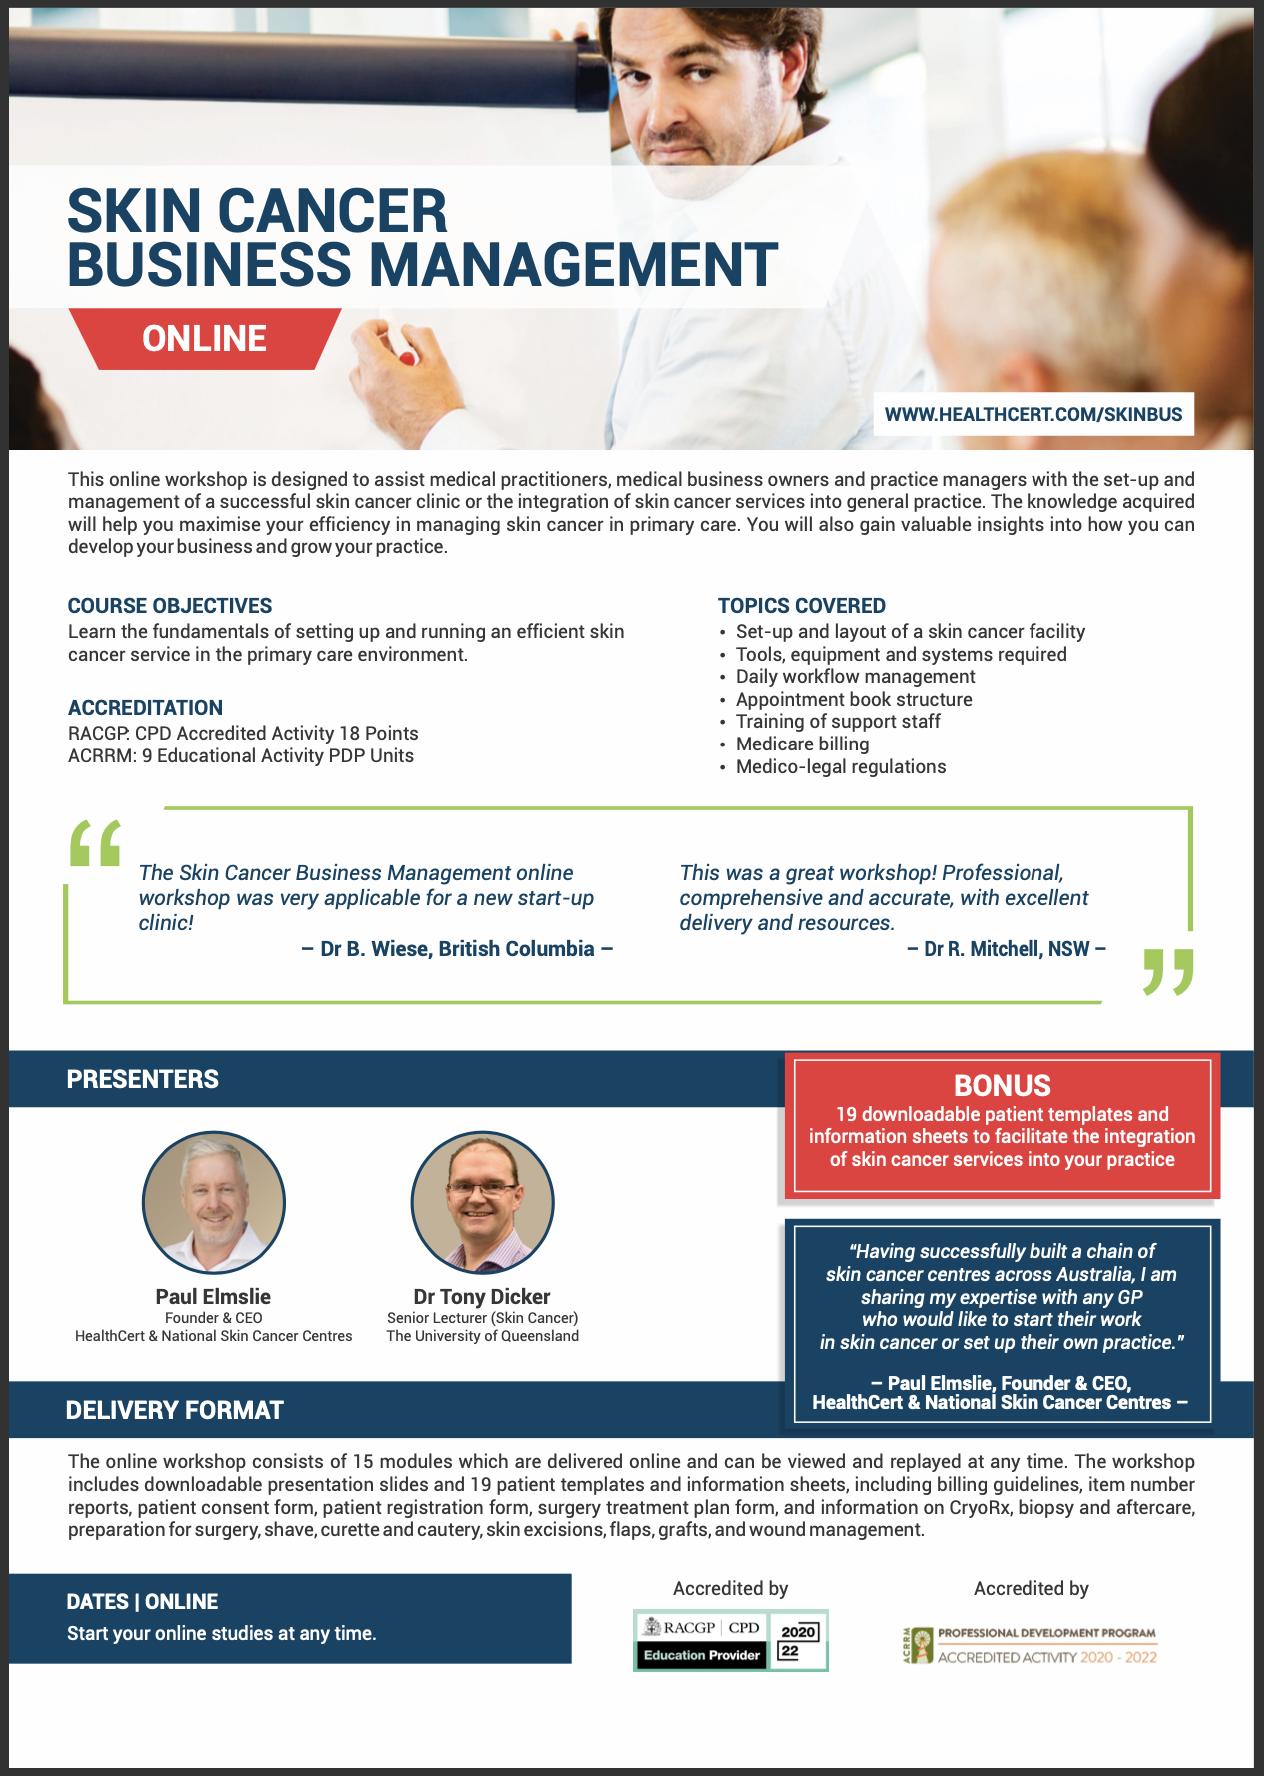 Skin Cancer Business Management Course Brochure